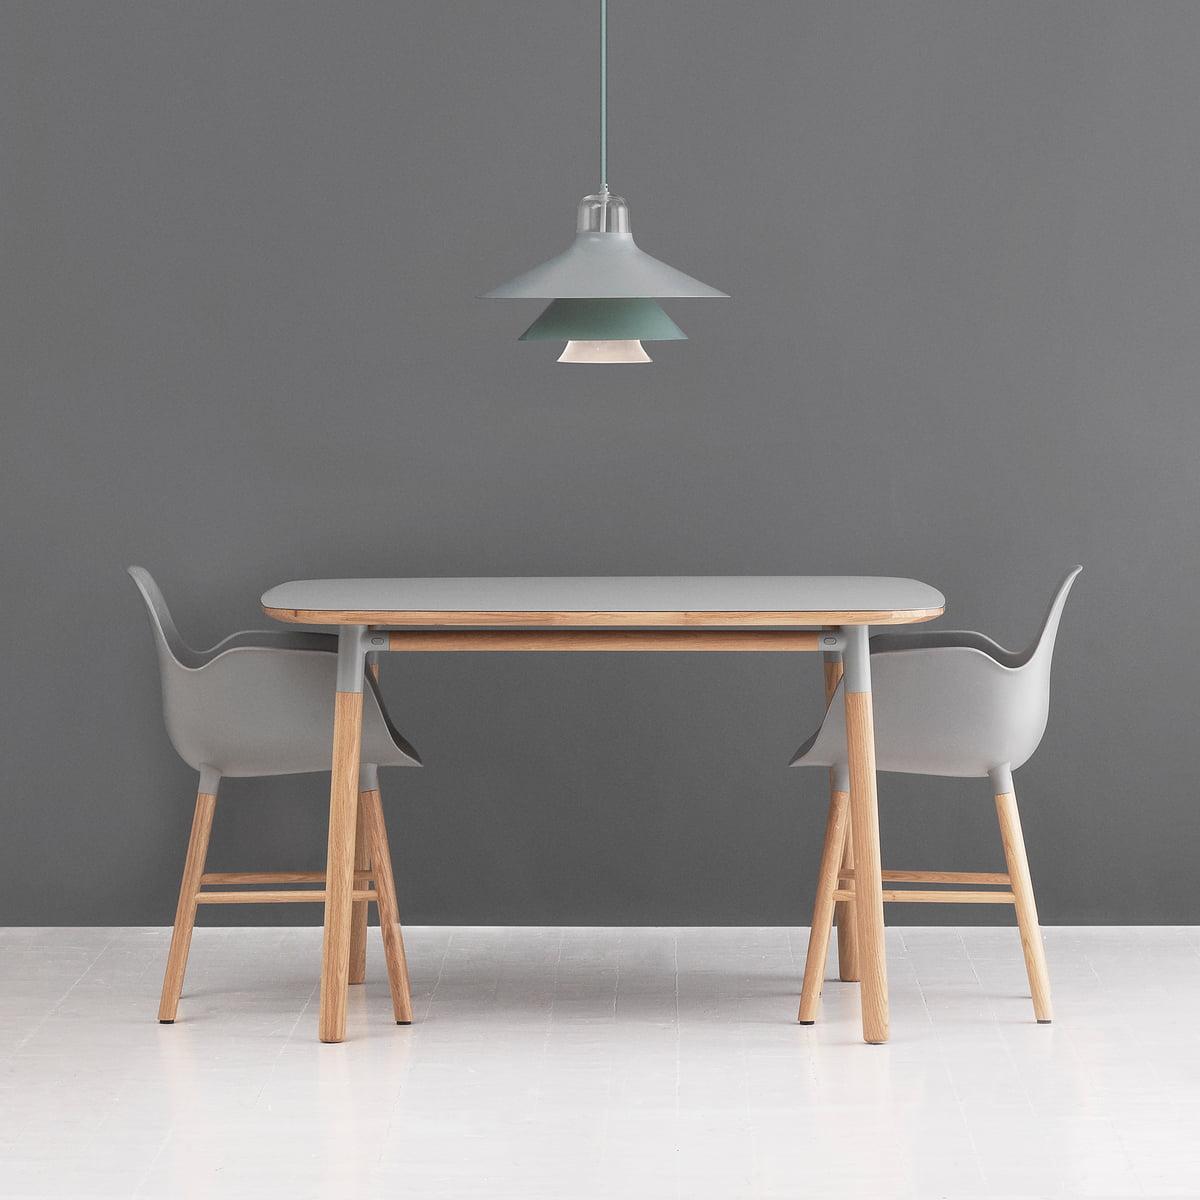 Form armlehnstuhl holz von normann copenhagen for Designer armlehnstuhl